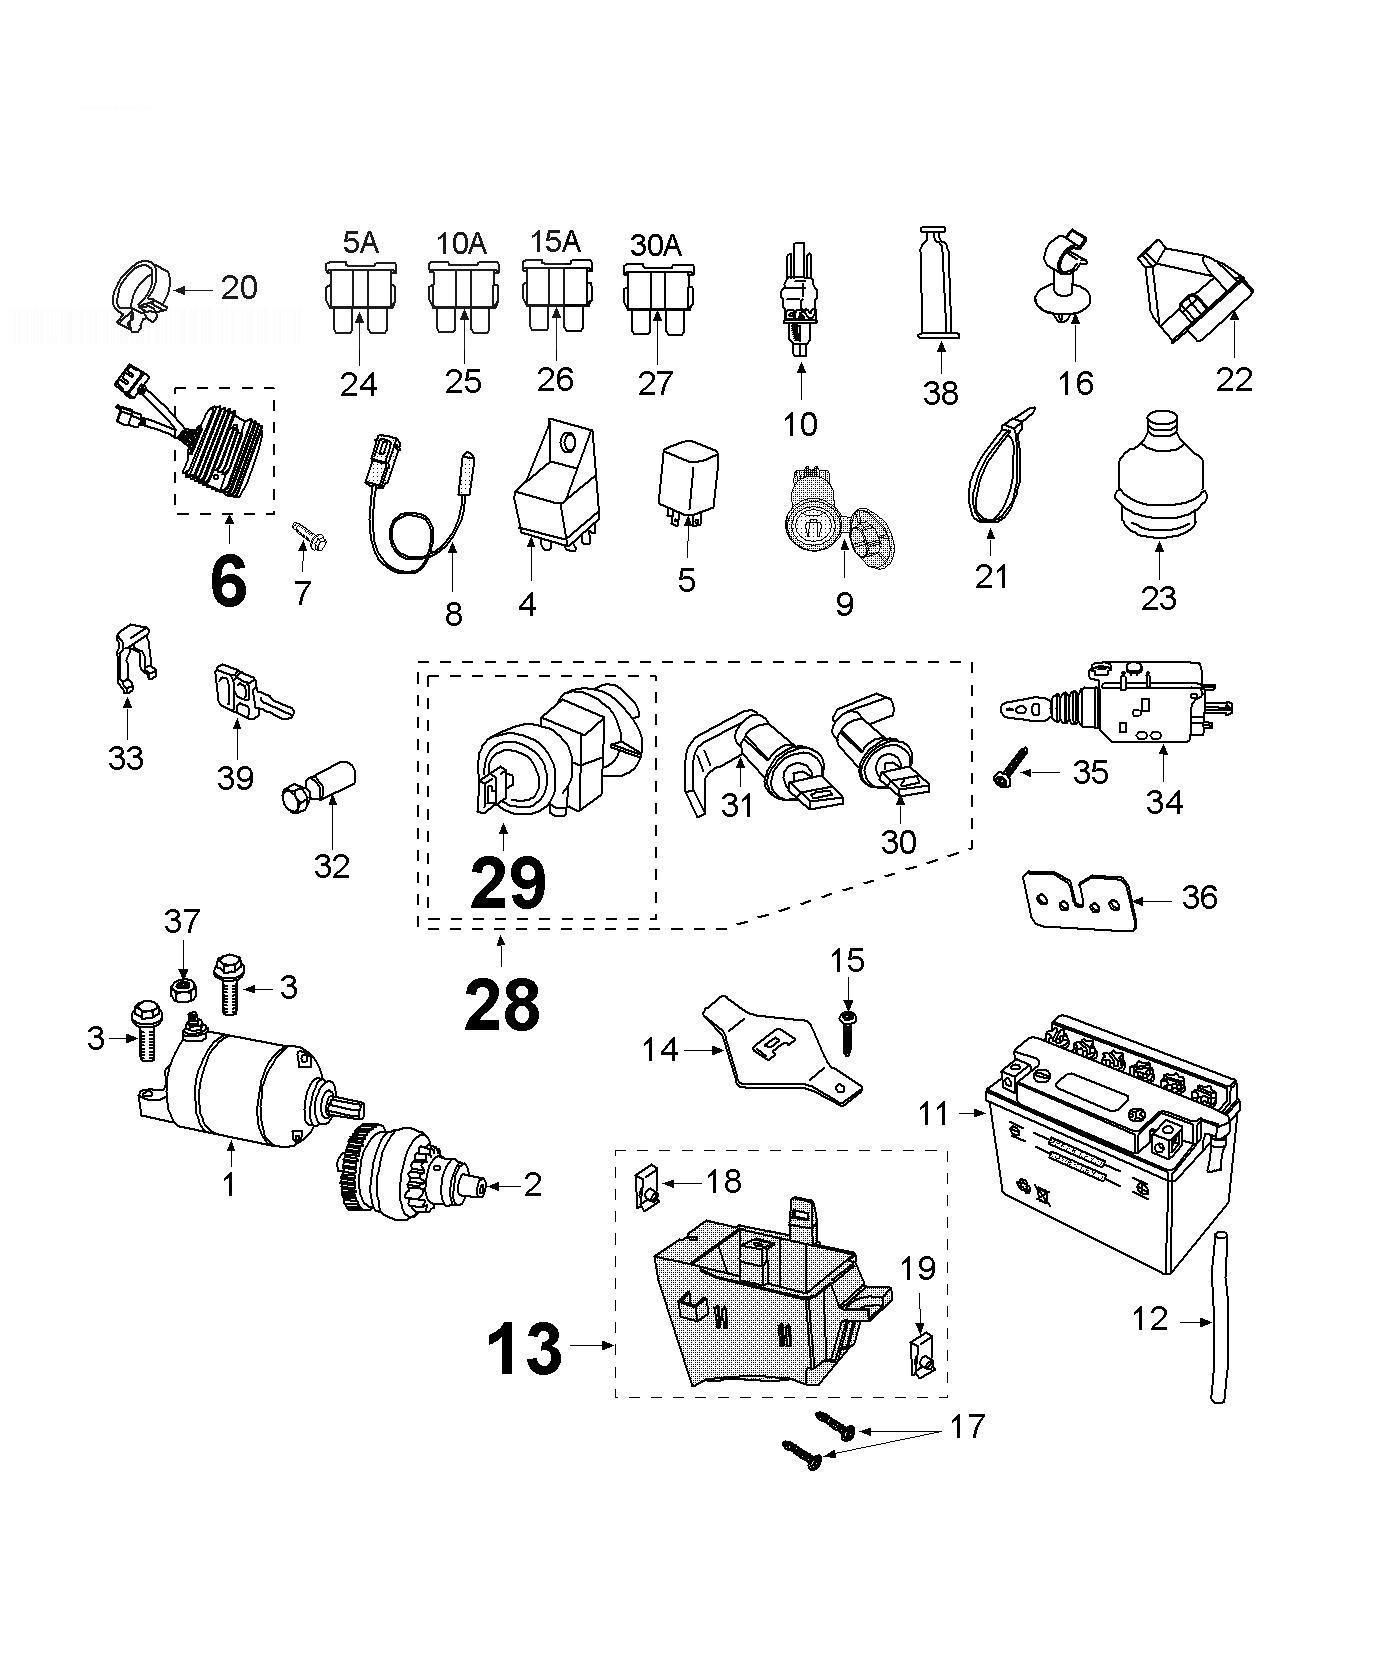 Peugeot Satelis 125 Electric Equipment